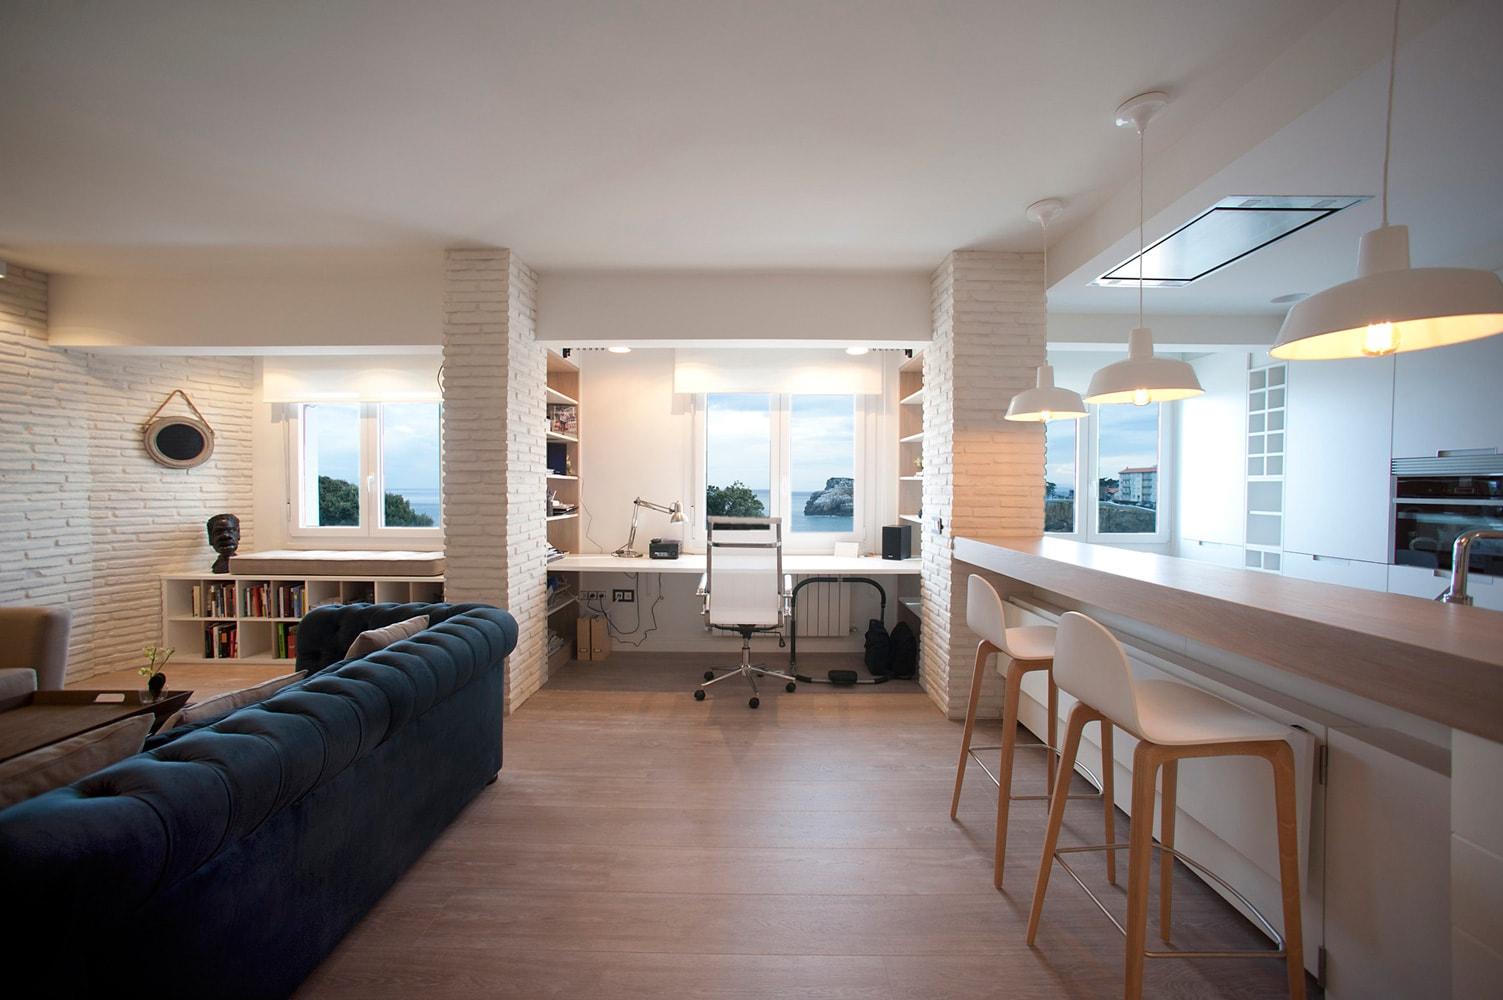 Sube Interiorismo Bilbao reforma integral de vivienda